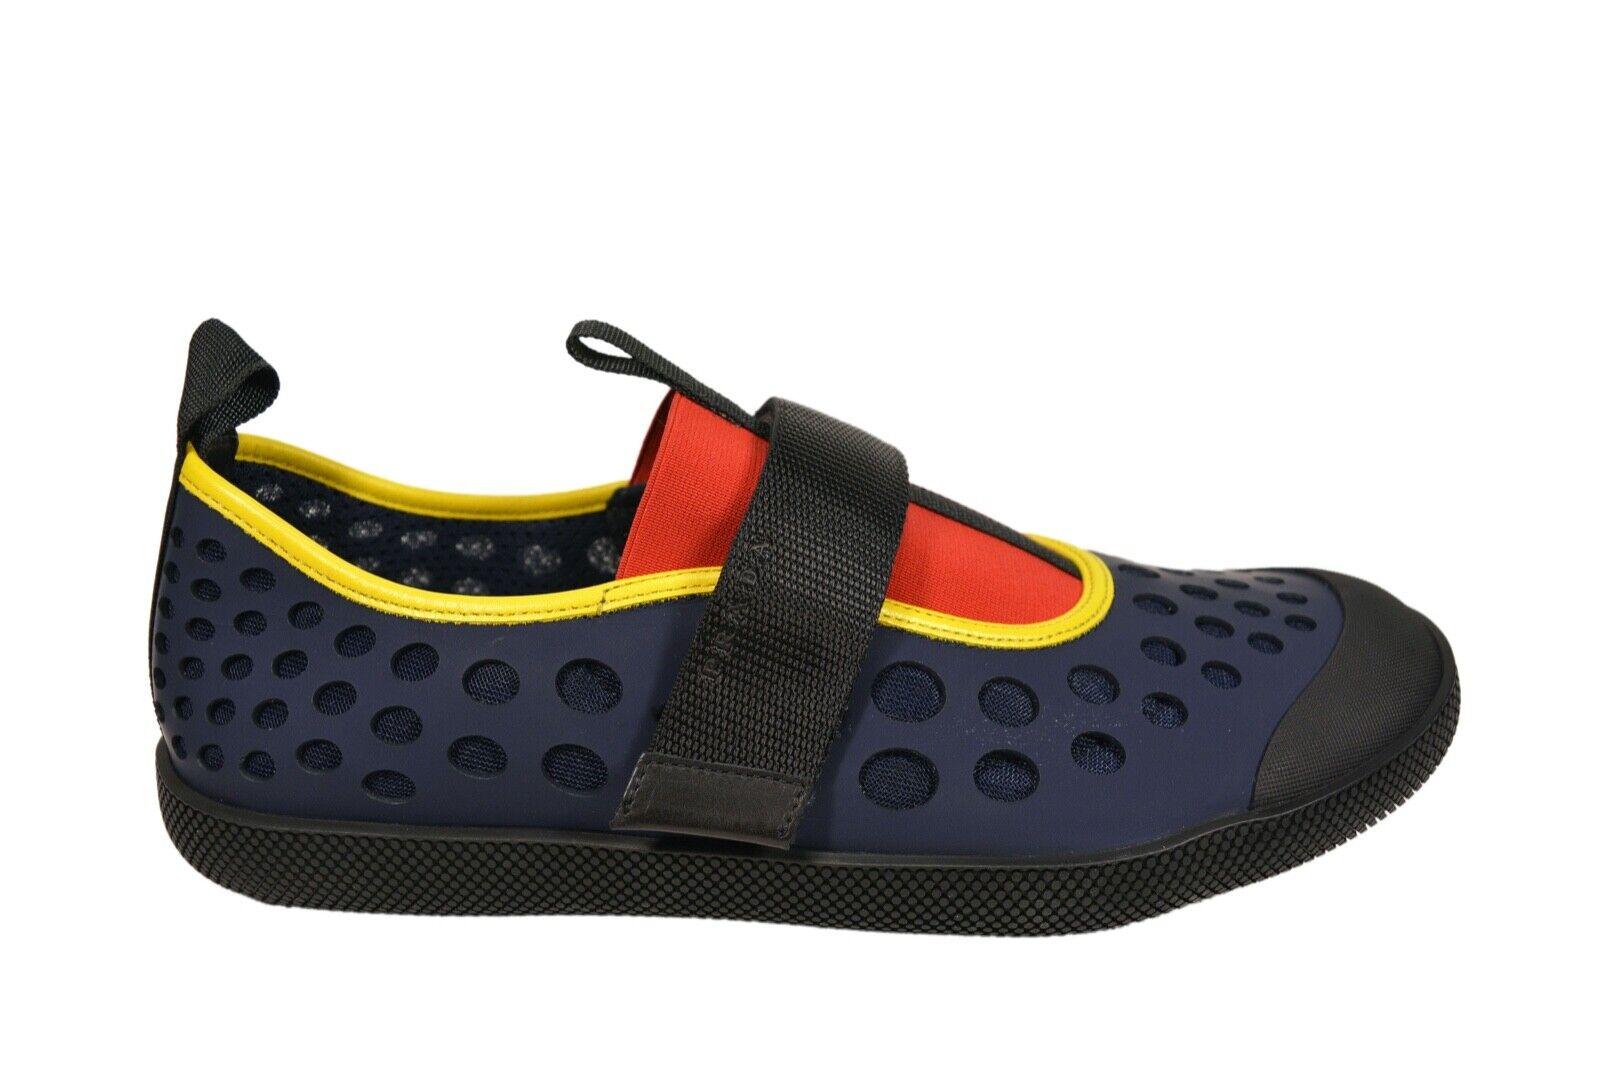 New Authentic PRADA Leather Mens Sneakers Shoes Schuhe US12 EU45 UK11 2OG042